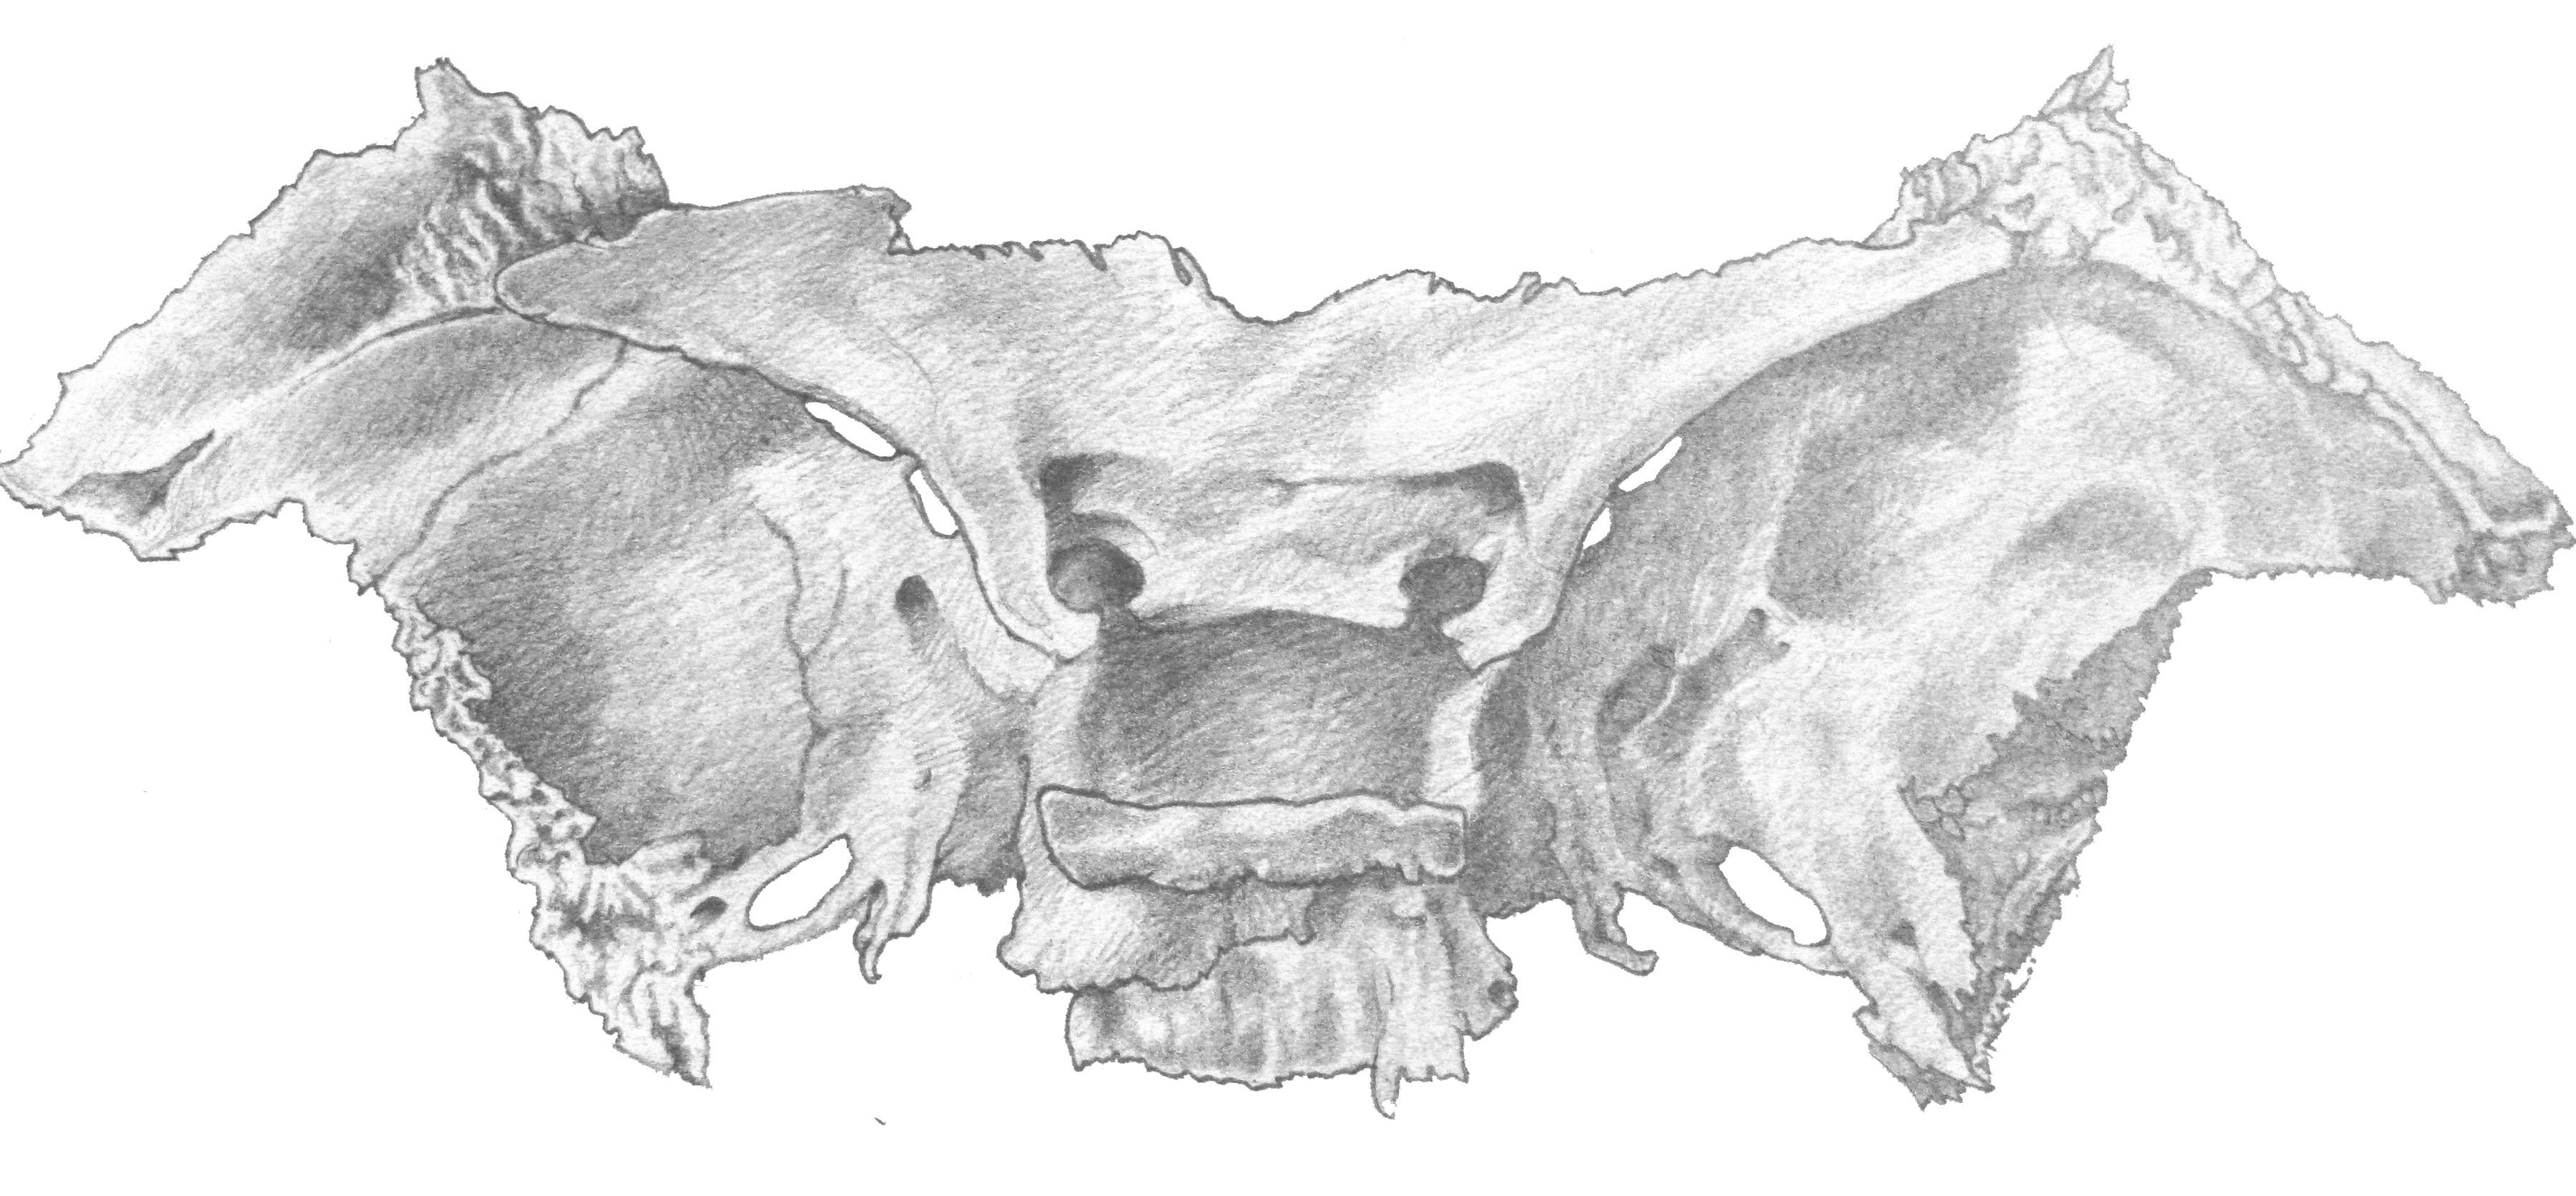 sphenoid bone by dinnius on deviantart, Human Body